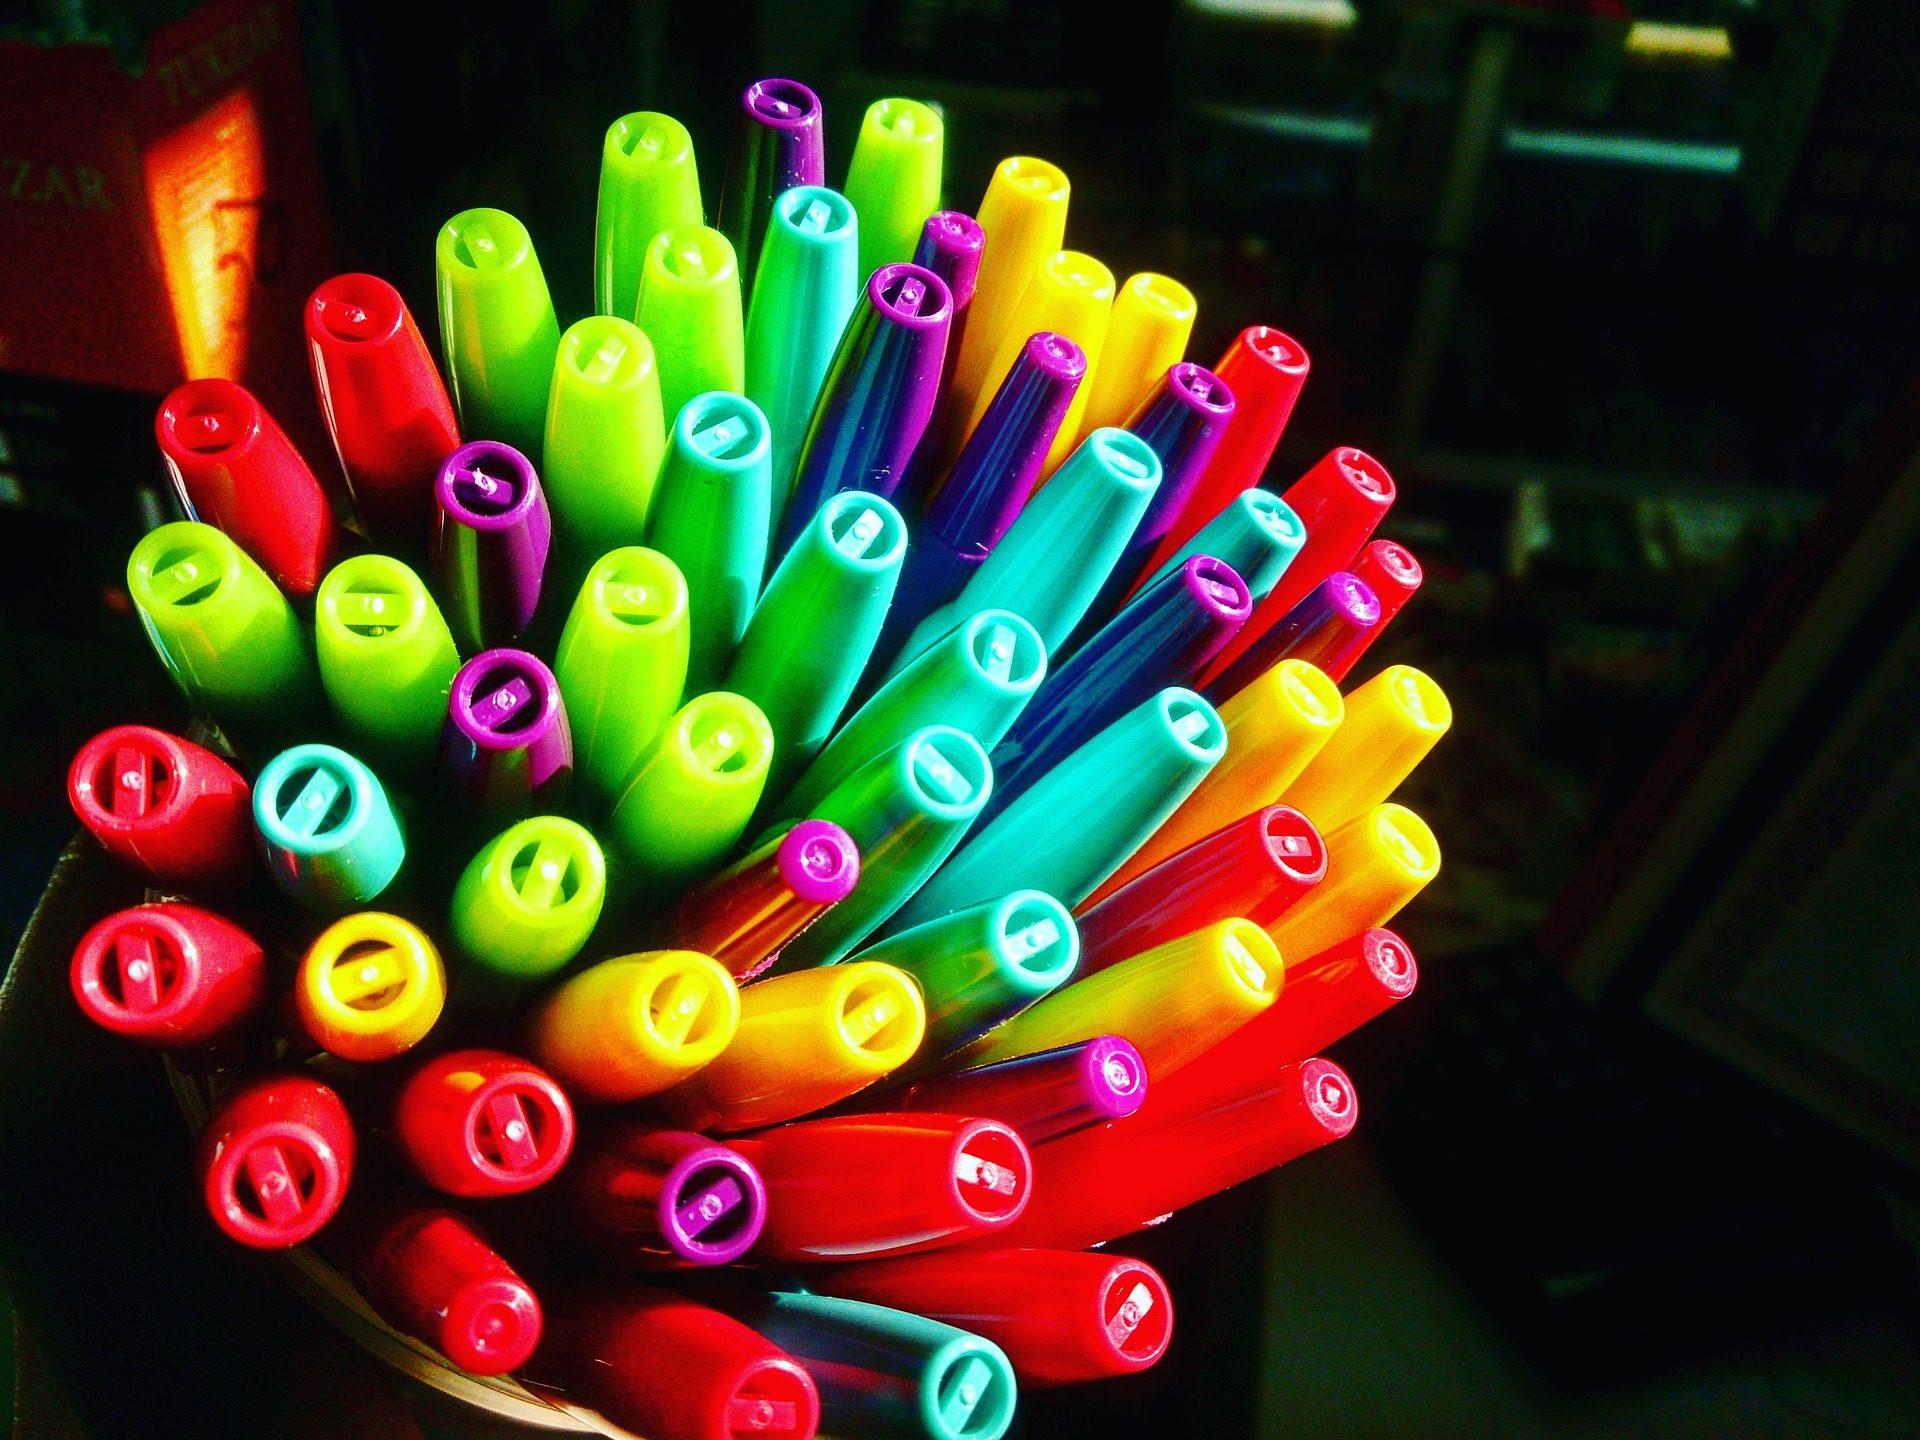 bolígrafos, rotuladores, cantidad, colorido, lapicero - Fondos de Pantalla HD - professor-falken.com